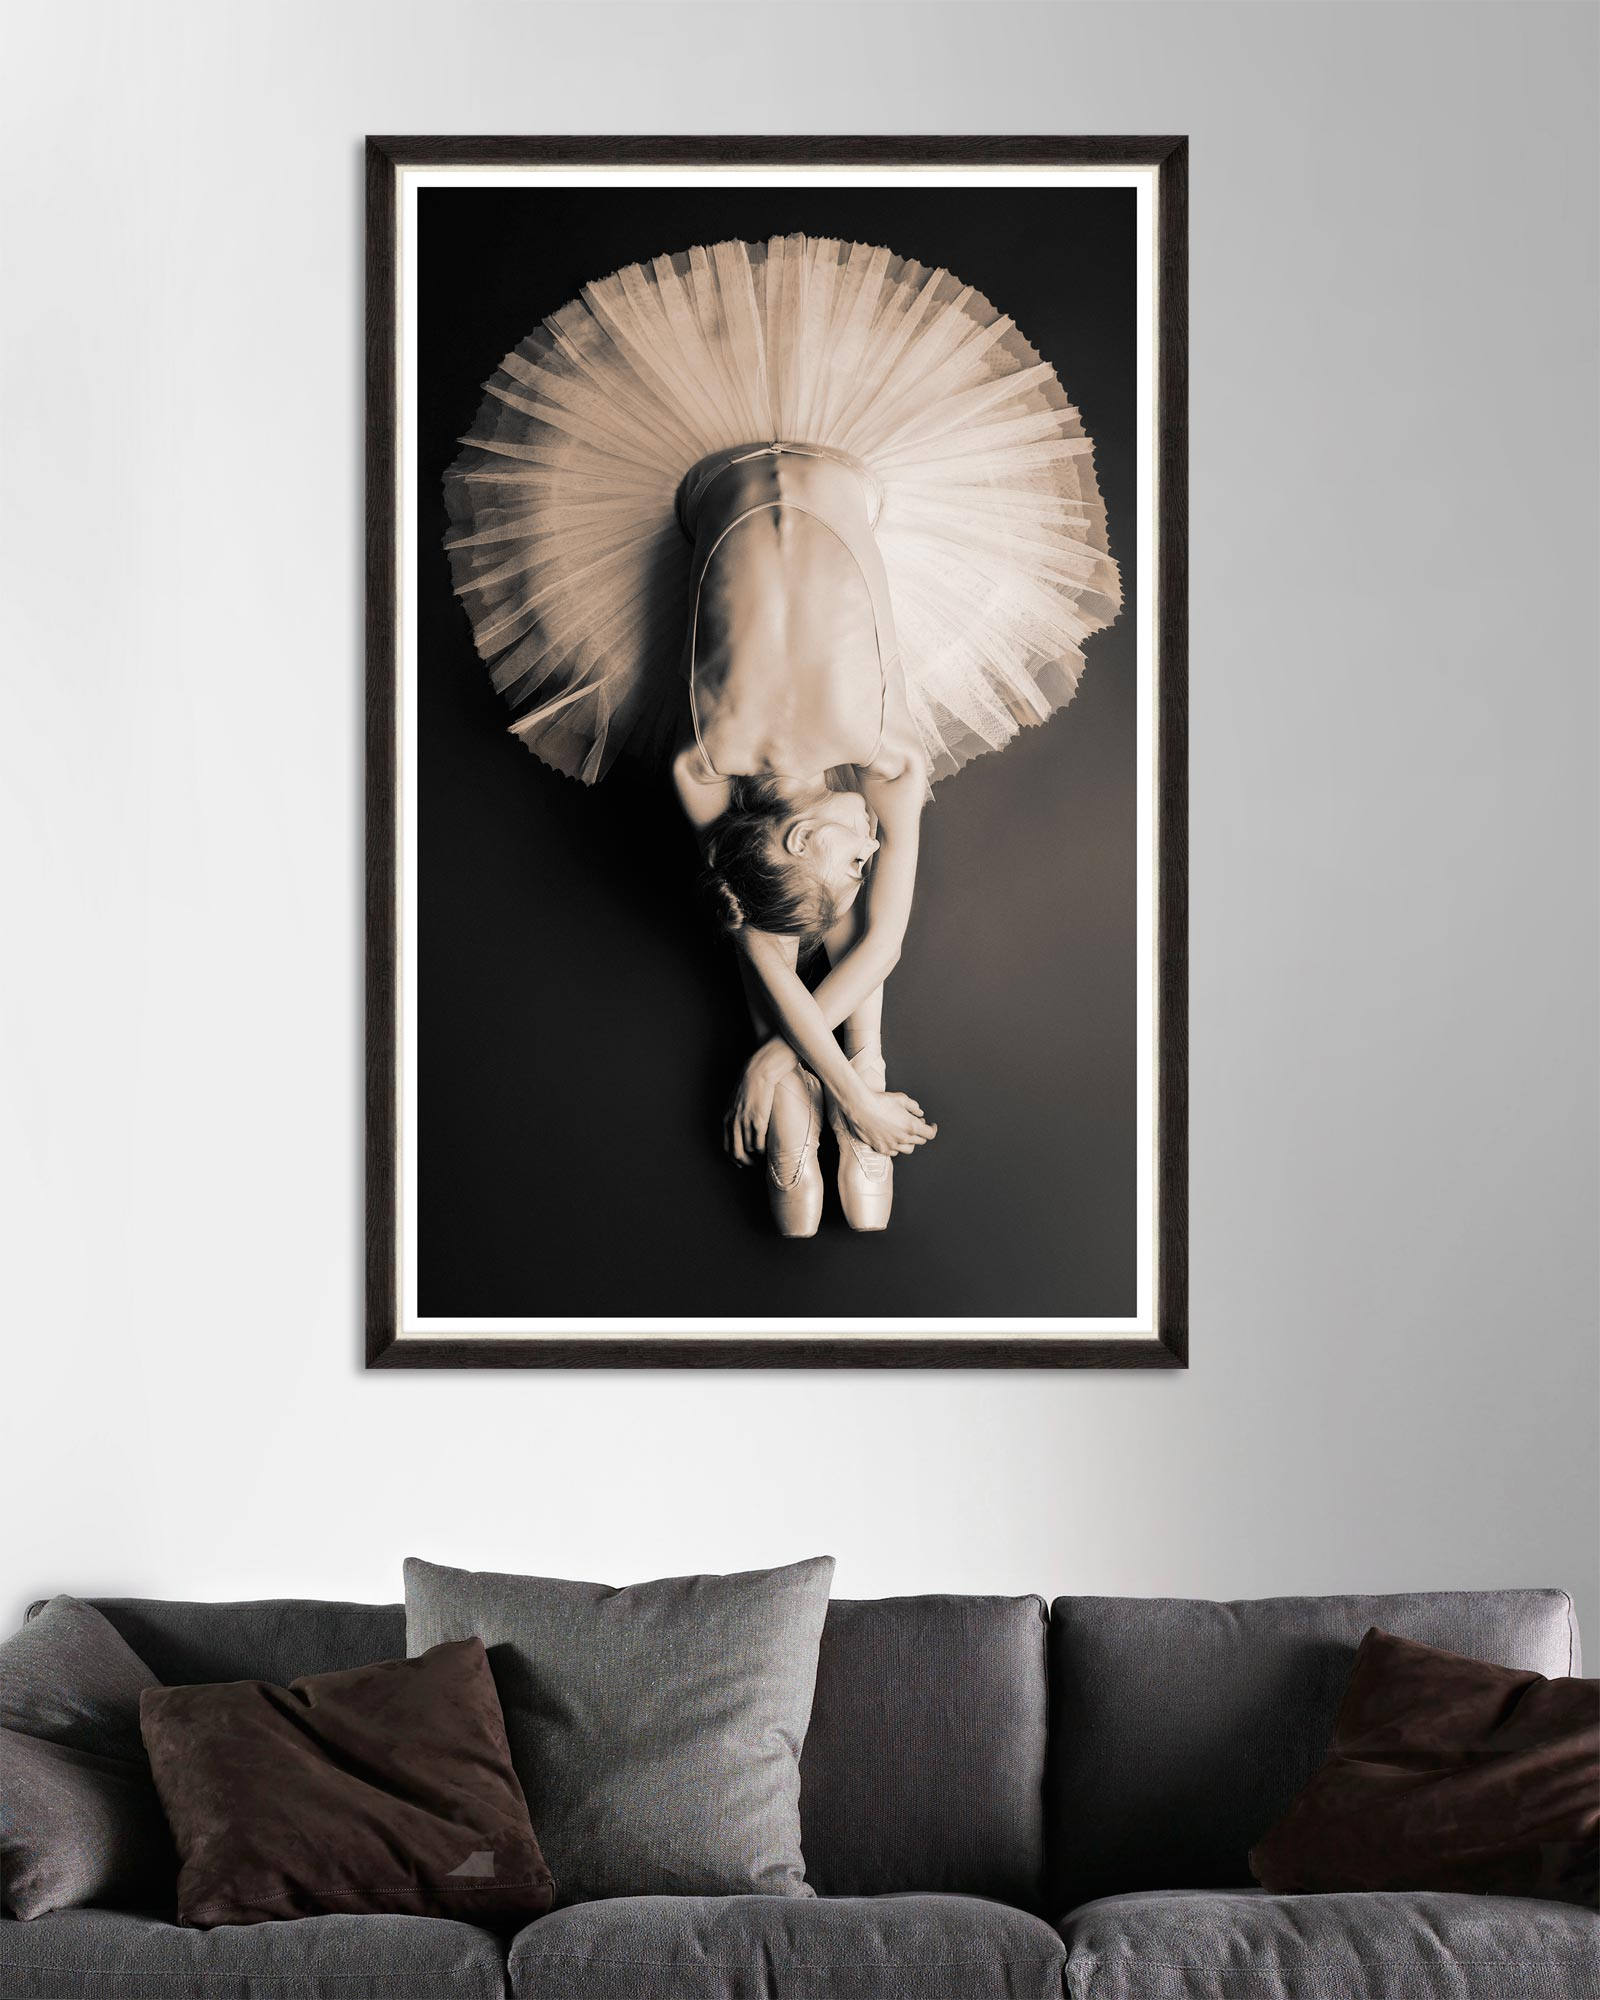 Tablou Framed Art The Sleeping Beauty